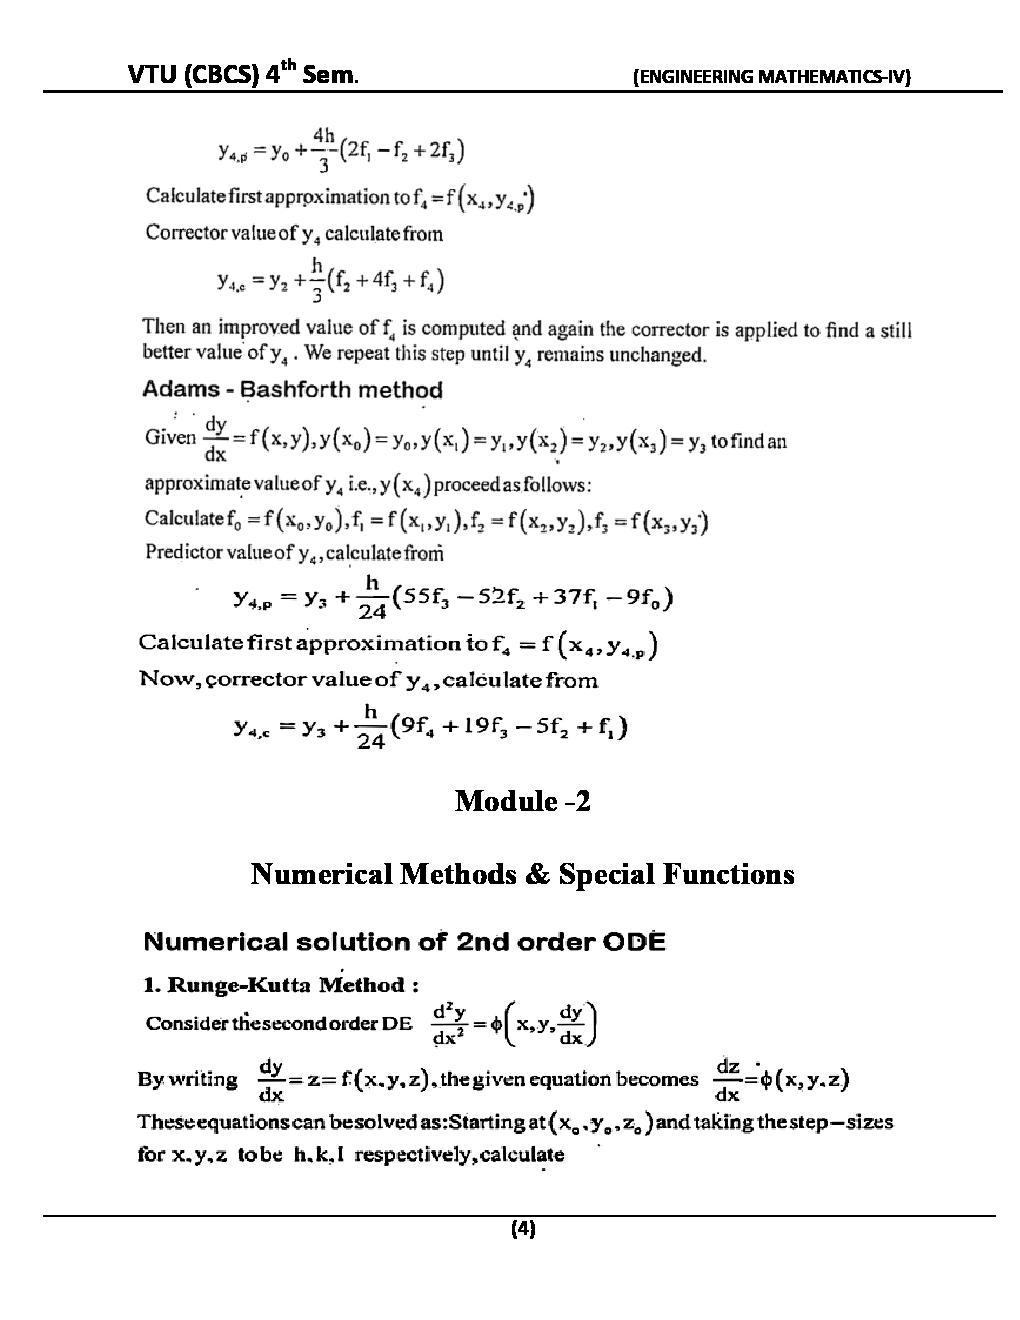 Engineering Mathematics-IV  For VTU BE 4th Sem Civil Engineering - Page 5